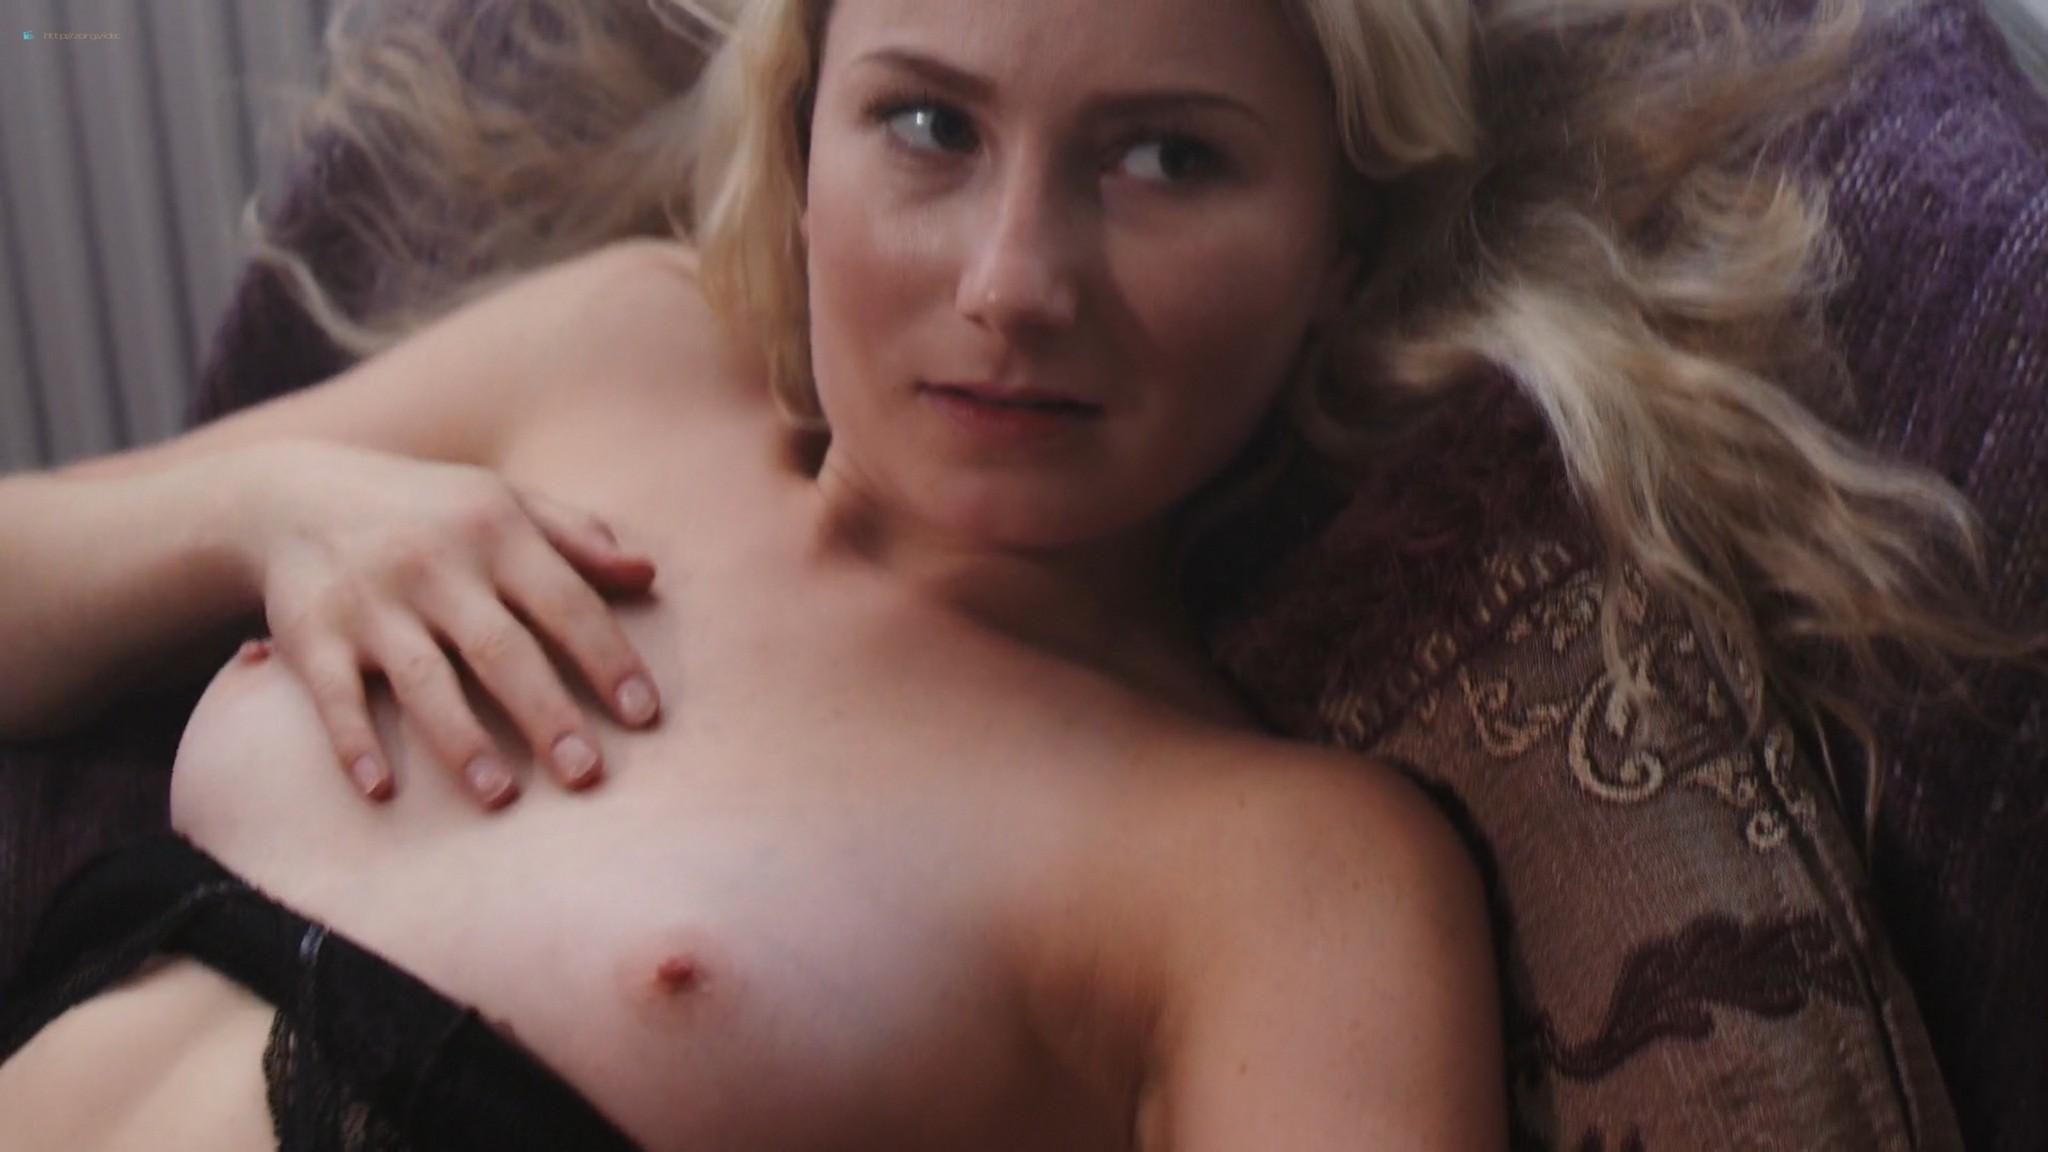 Keely Cat Wells nude Claudine-Helene Aumord full-frontal - Dirty Work (2018) HD 1080p Web (15)